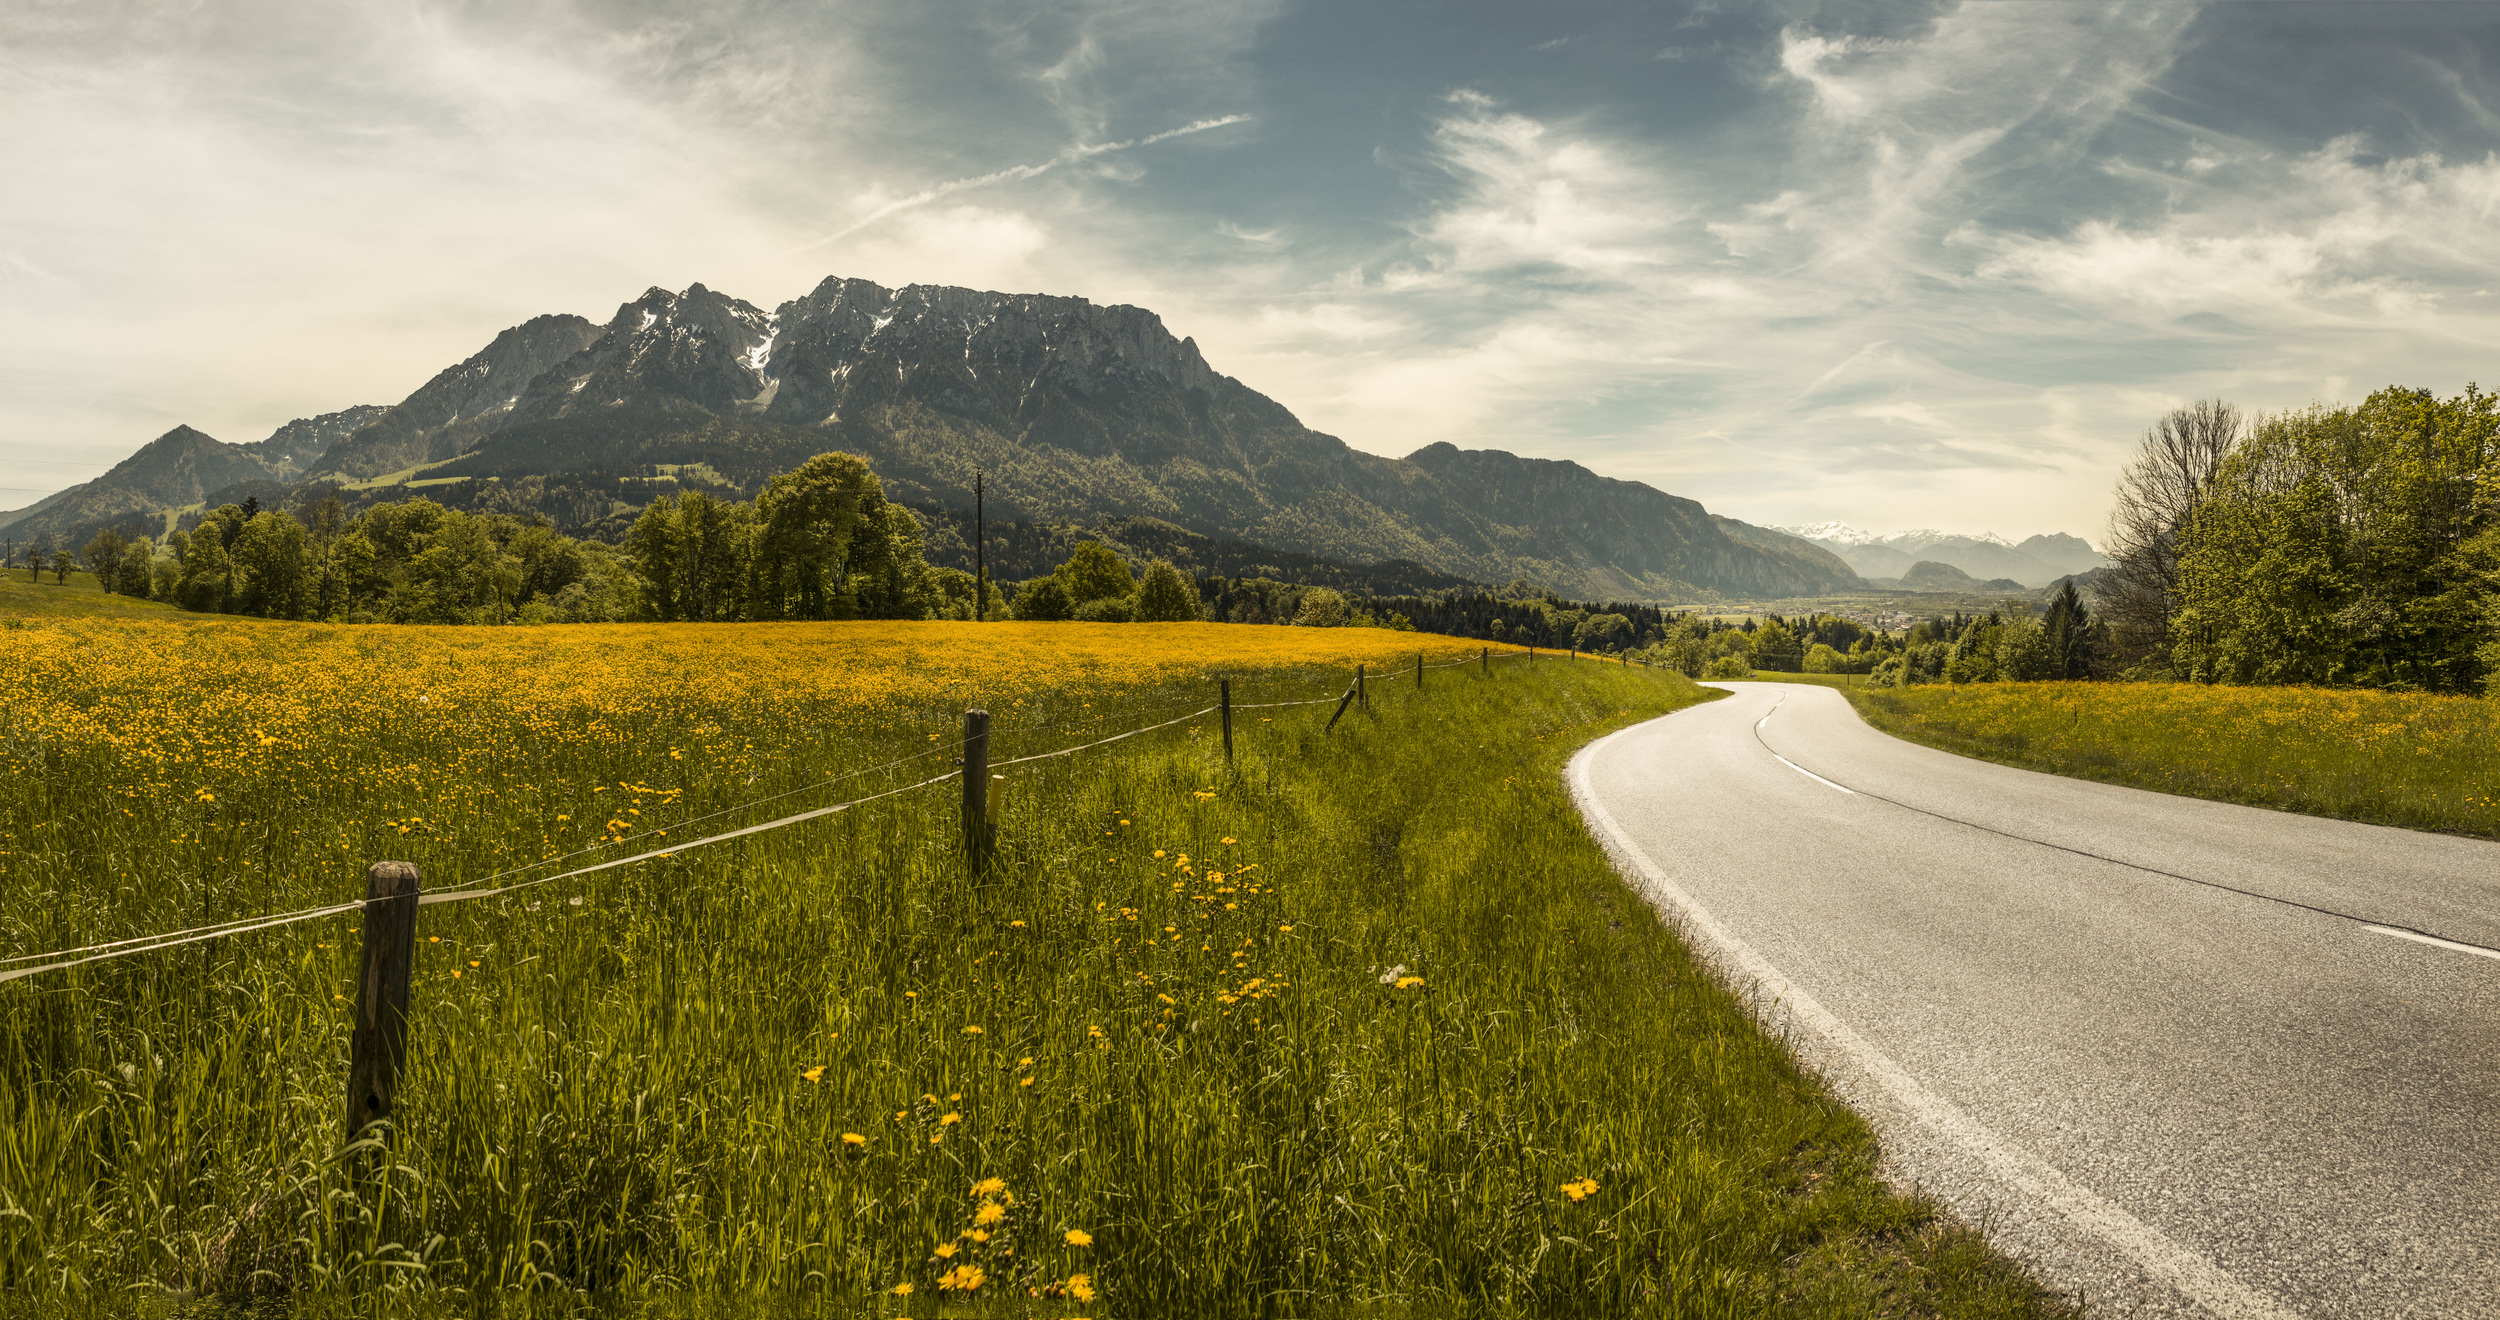 Tyrolean_Alps_finalsmall.jpg